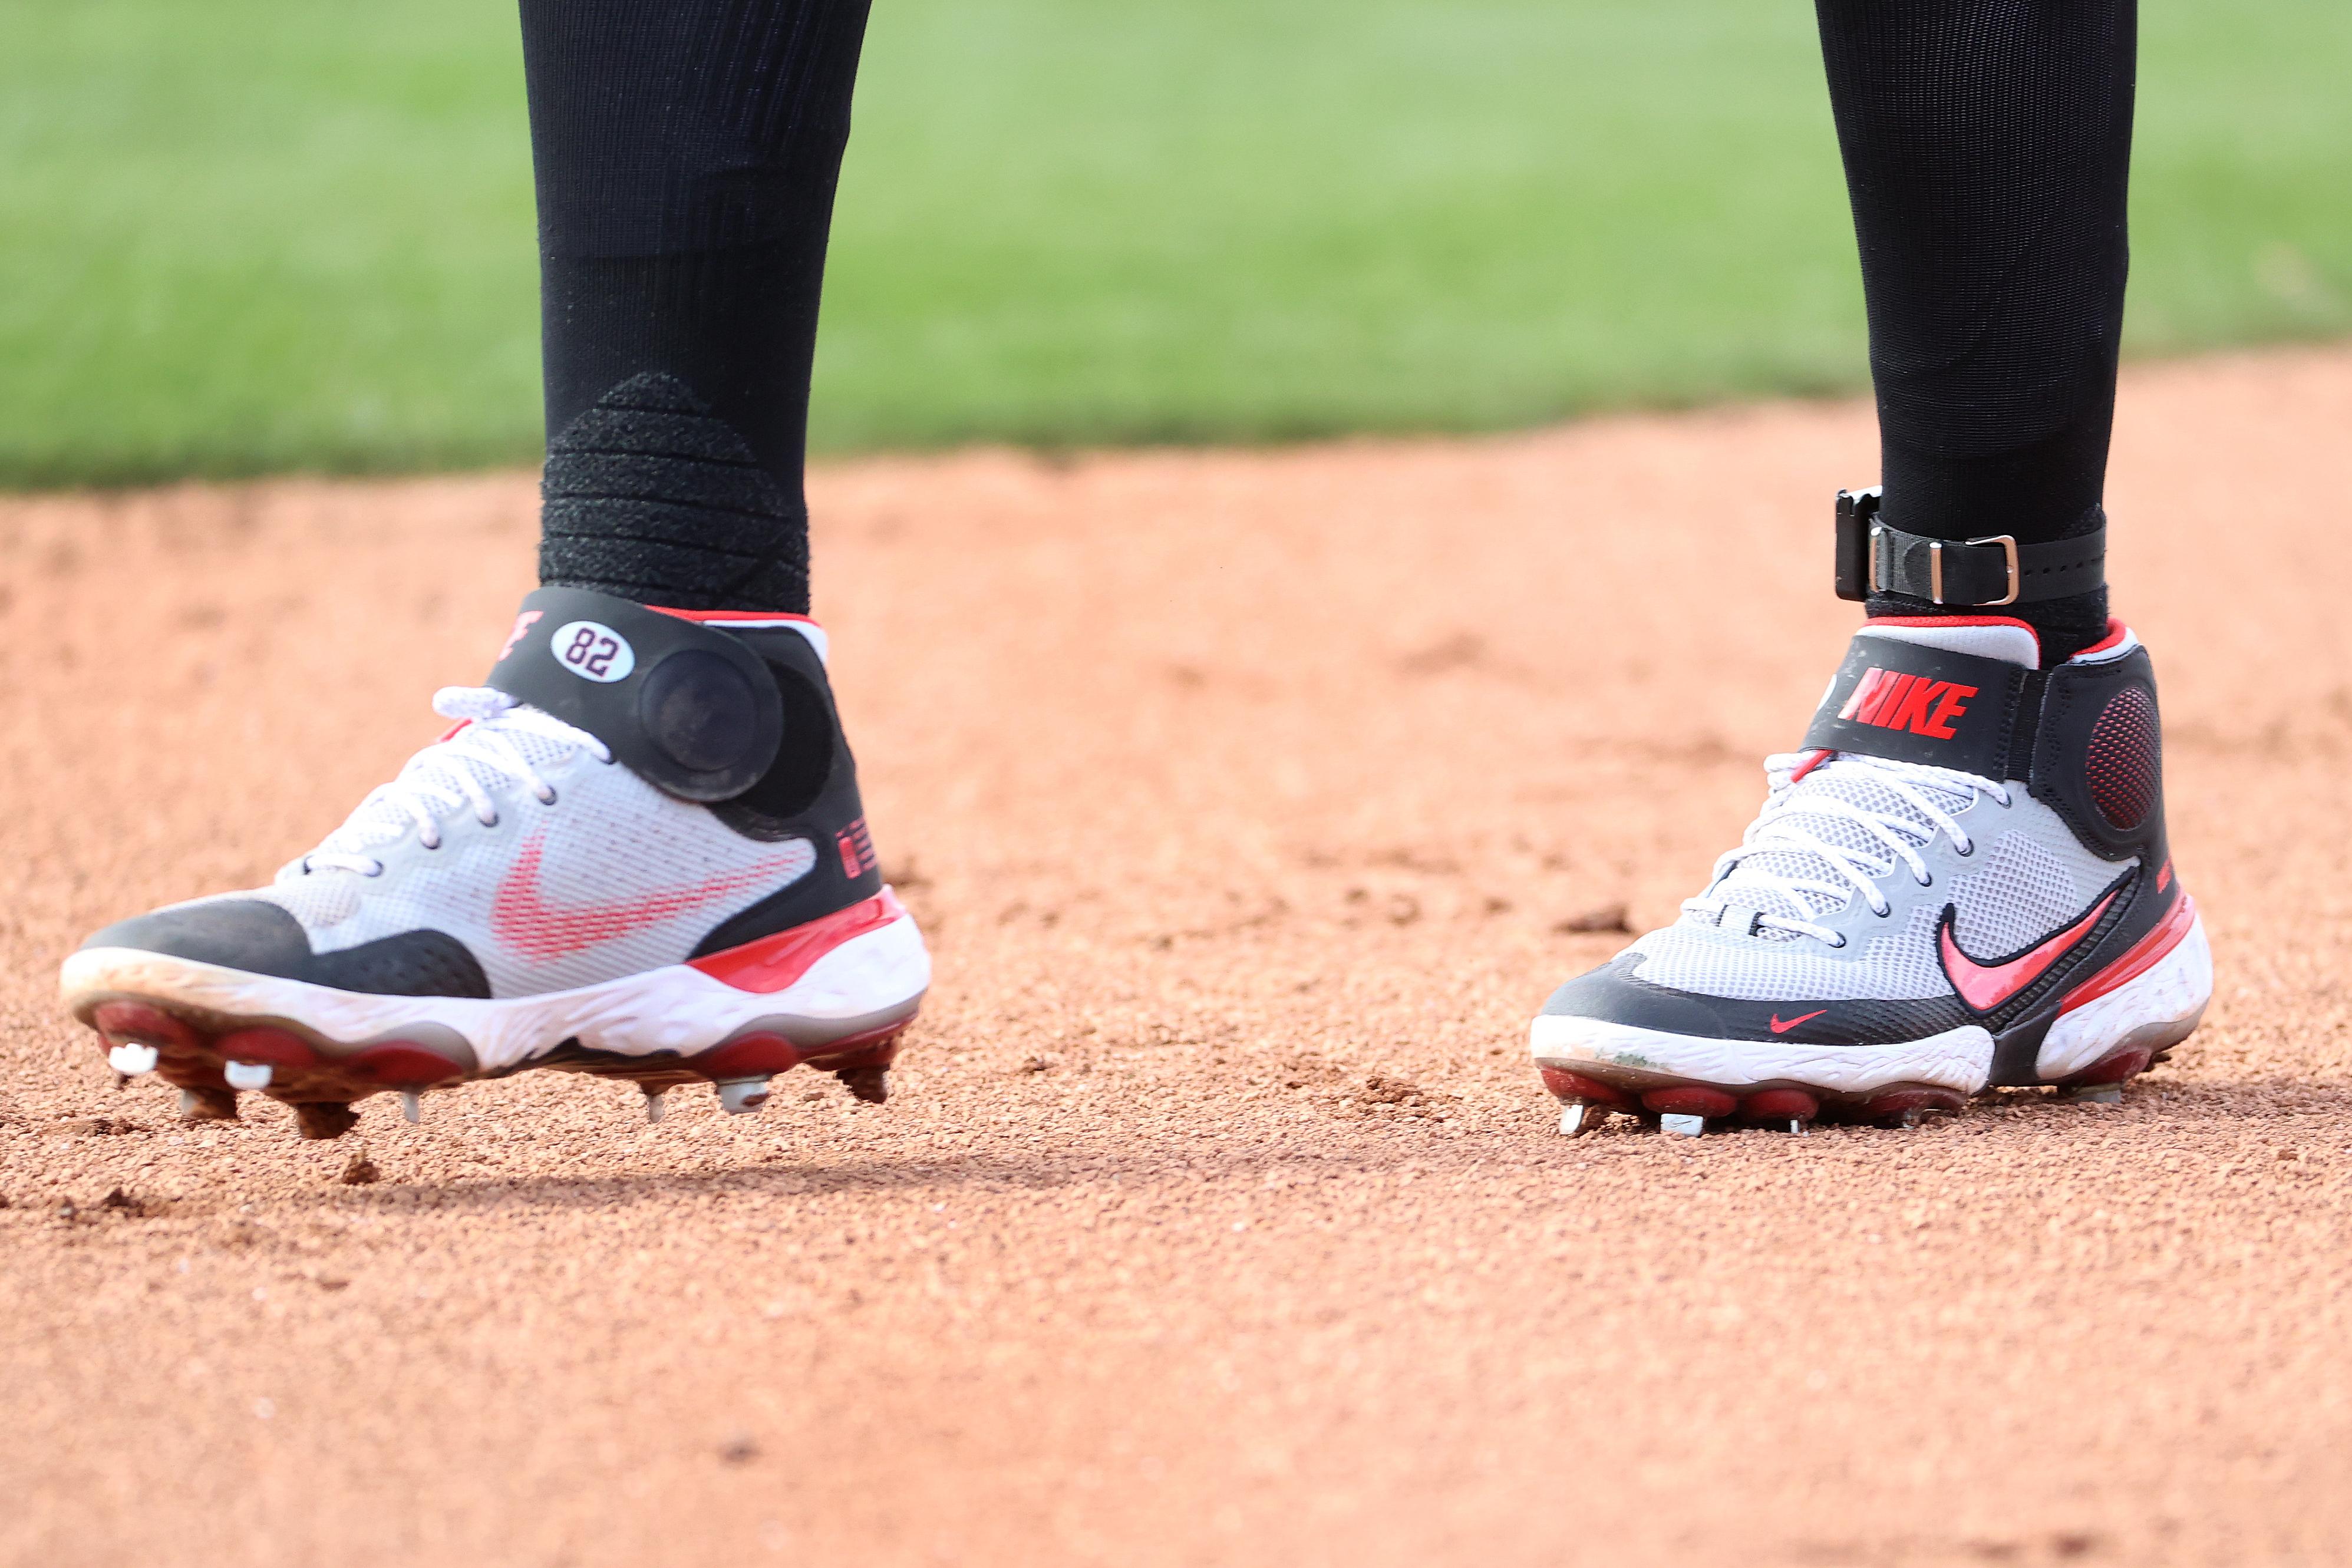 Geraldo Perdomo's shoes.